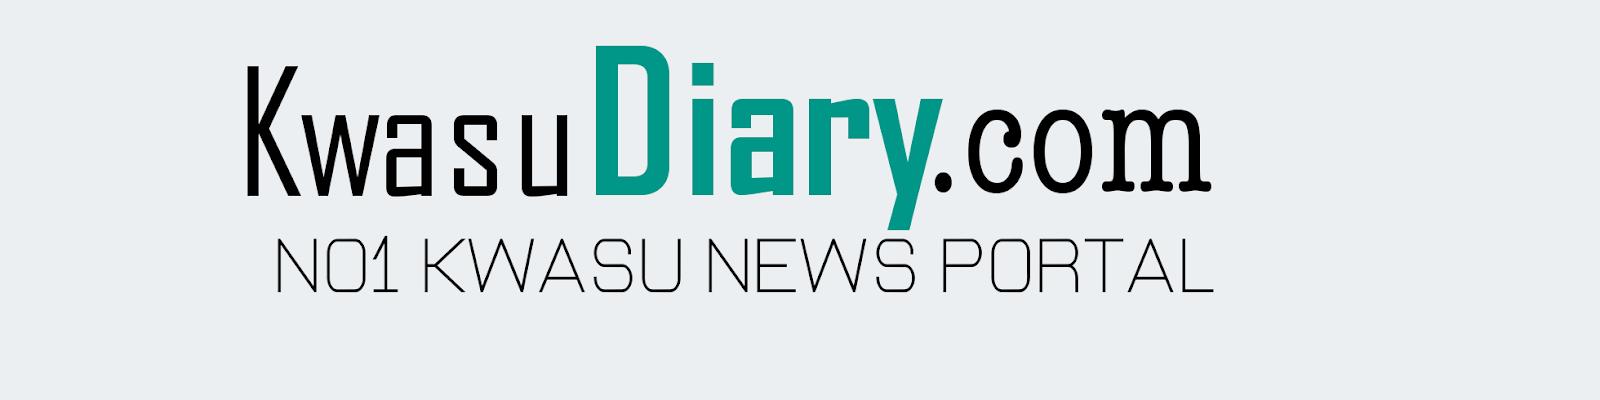 KWASUDIARY || No1 Kwasu News Portal